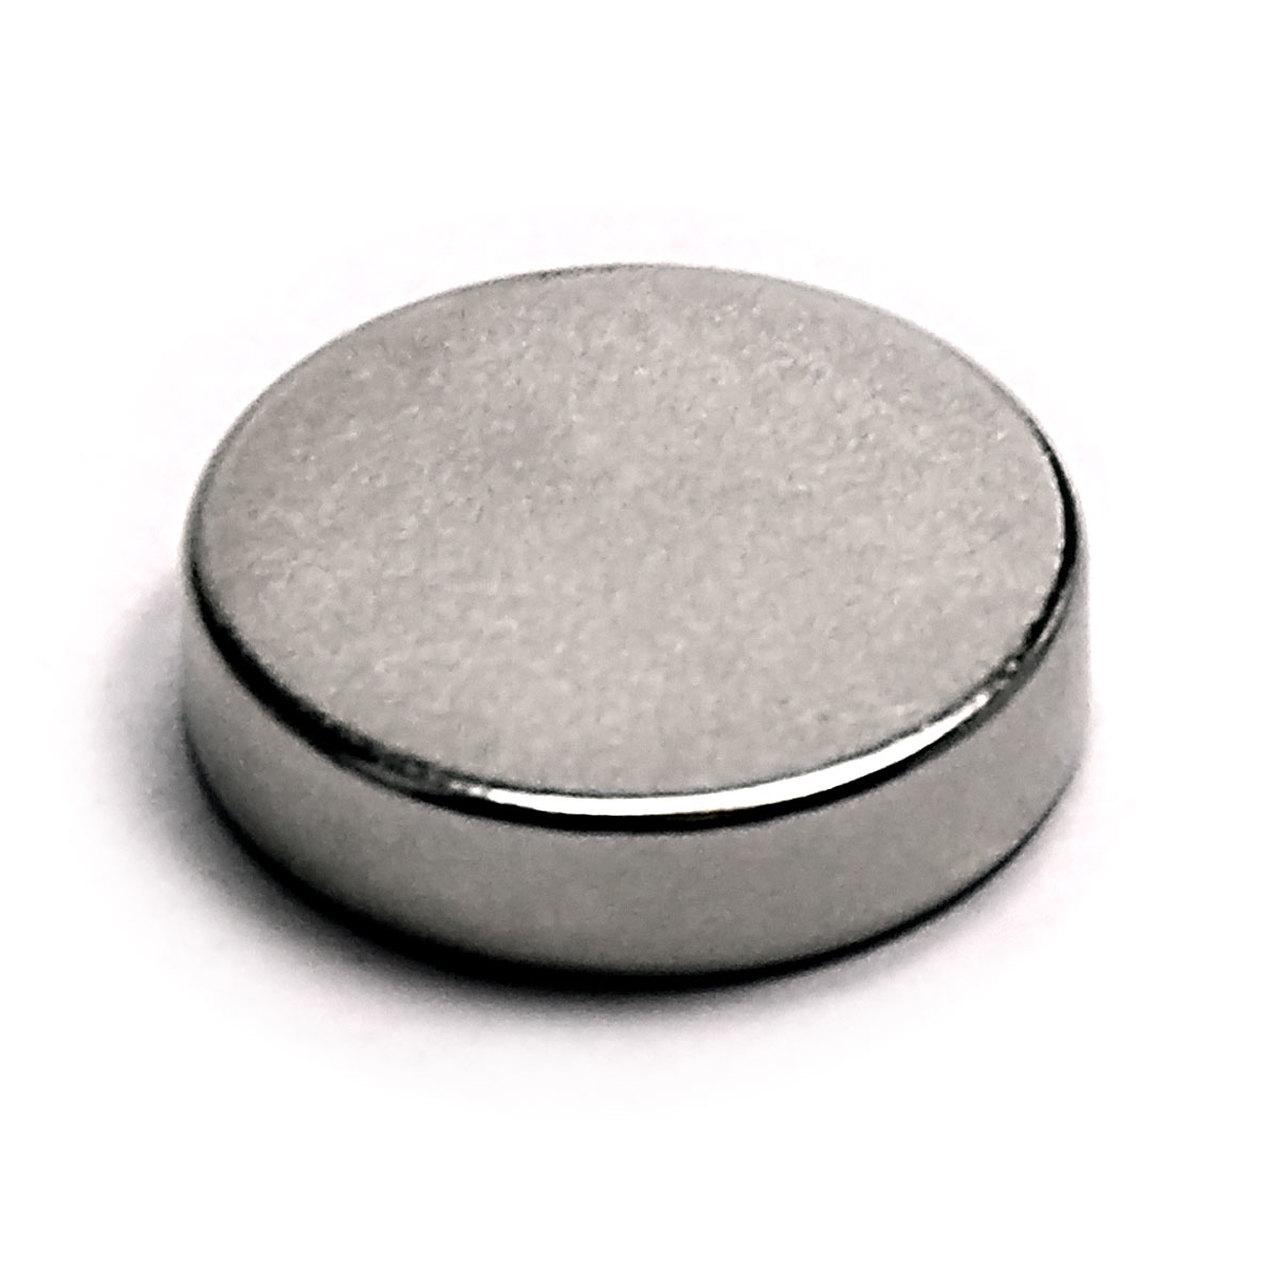 Selecting Neodymium Disc Magnets